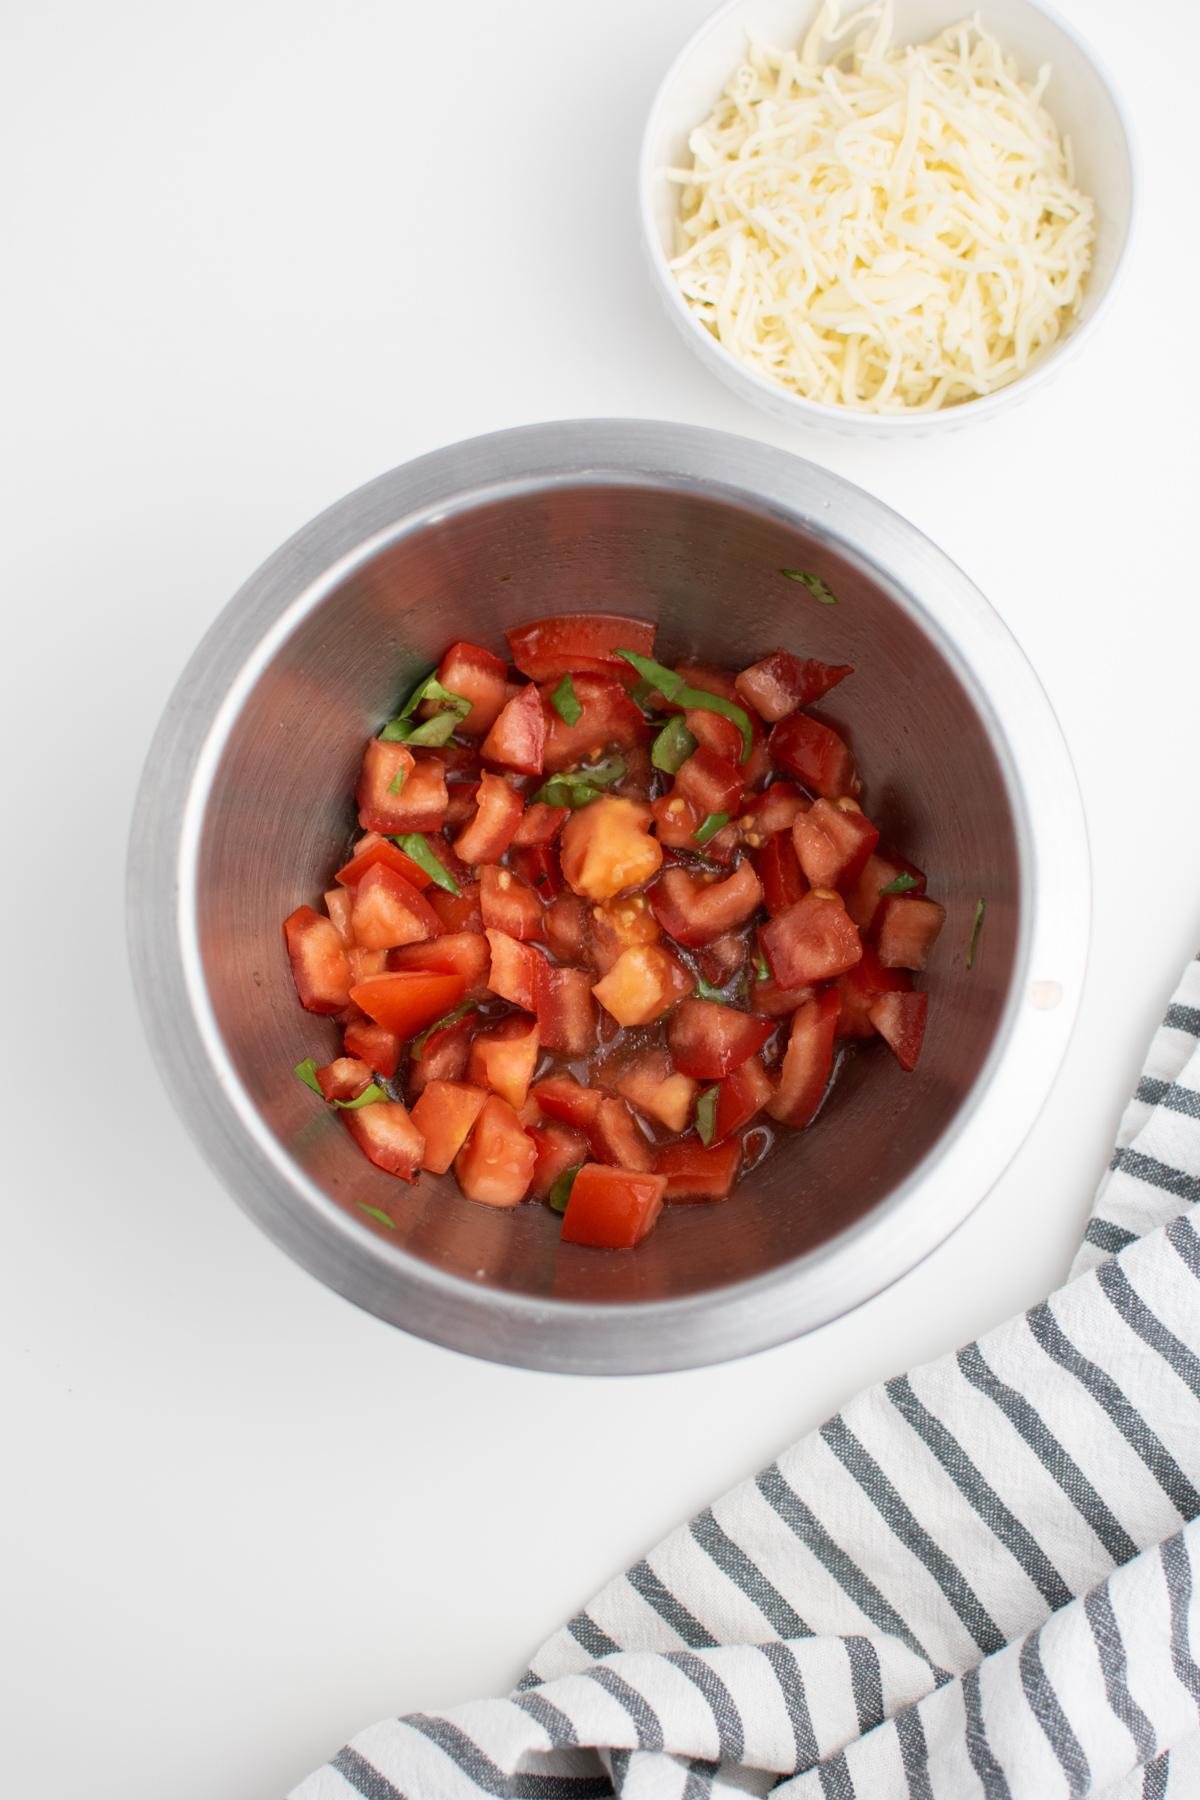 Fresh bruschetta in small bowl on white table.